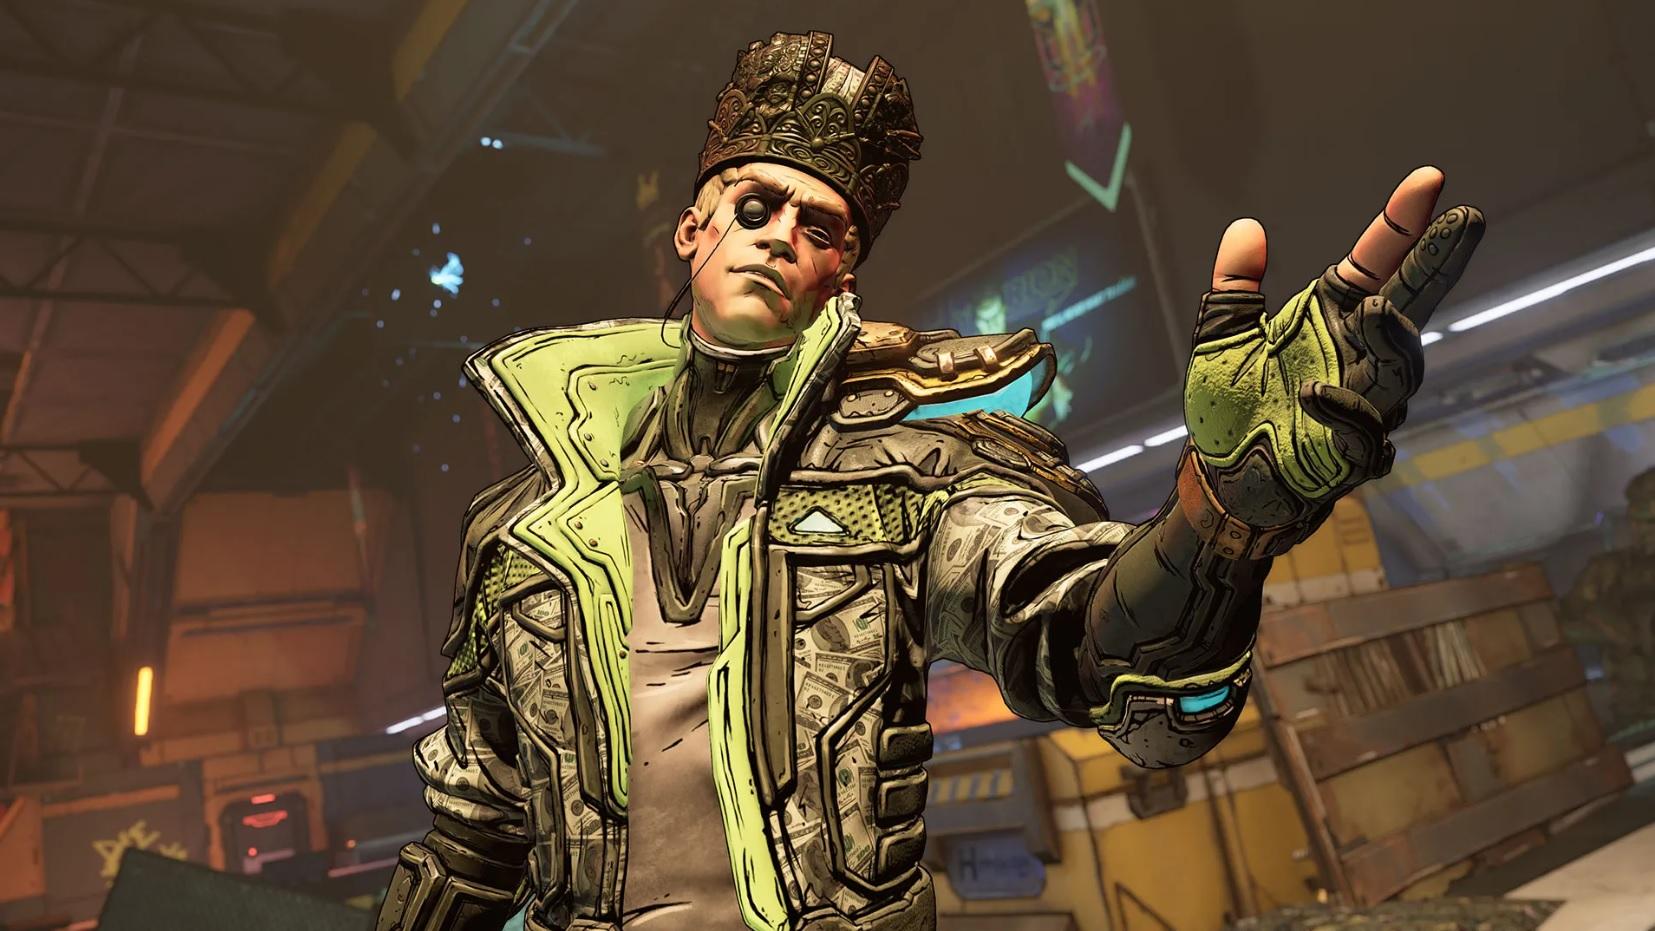 Gearbox is prepping Borderlands 3 for Mayhem Mode 2.0 screenshot